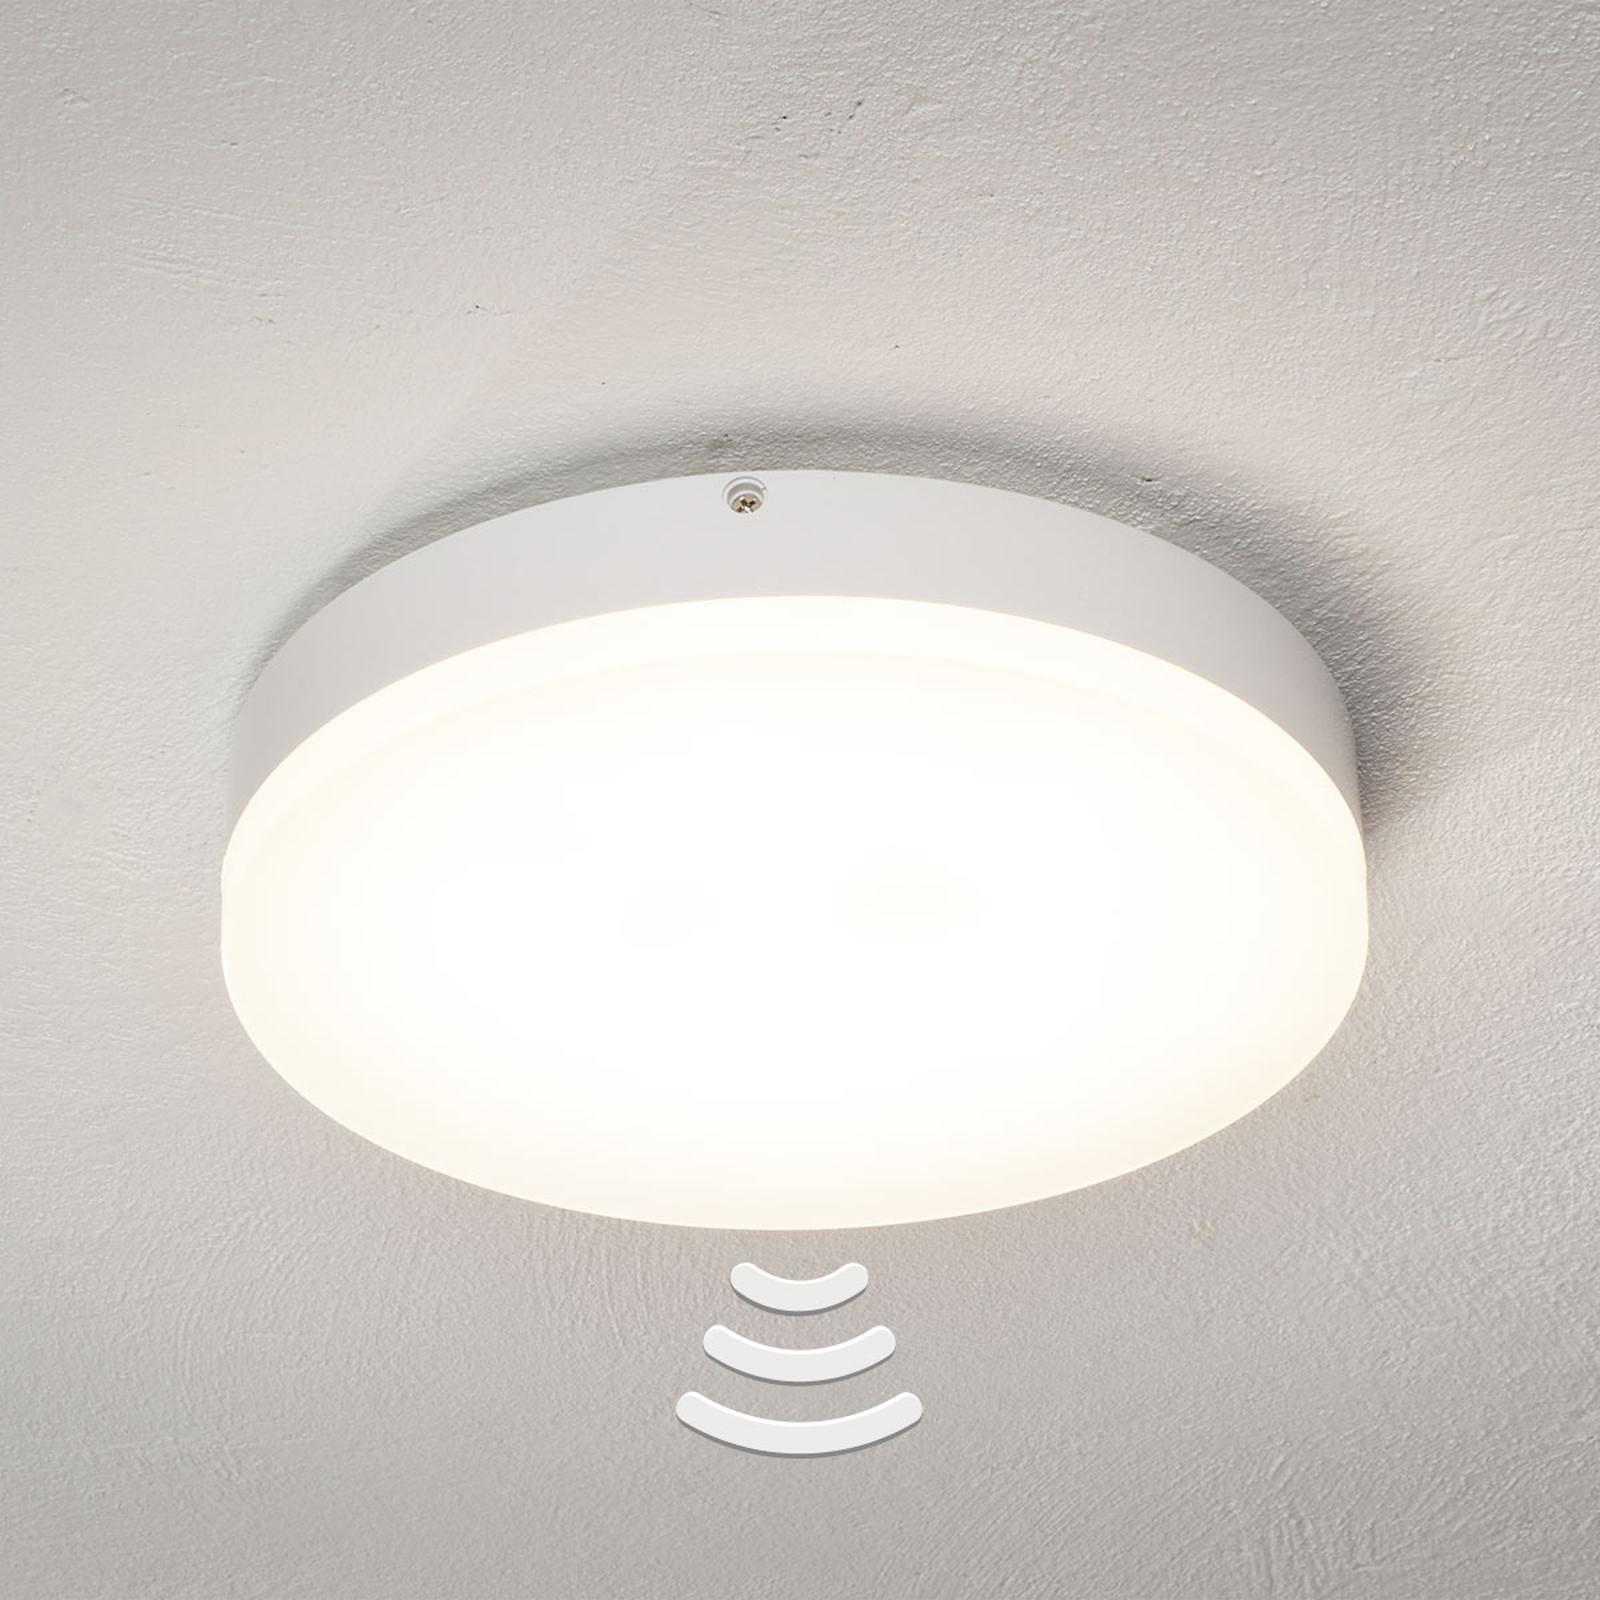 LED plafondlamp Office Round - met sensor